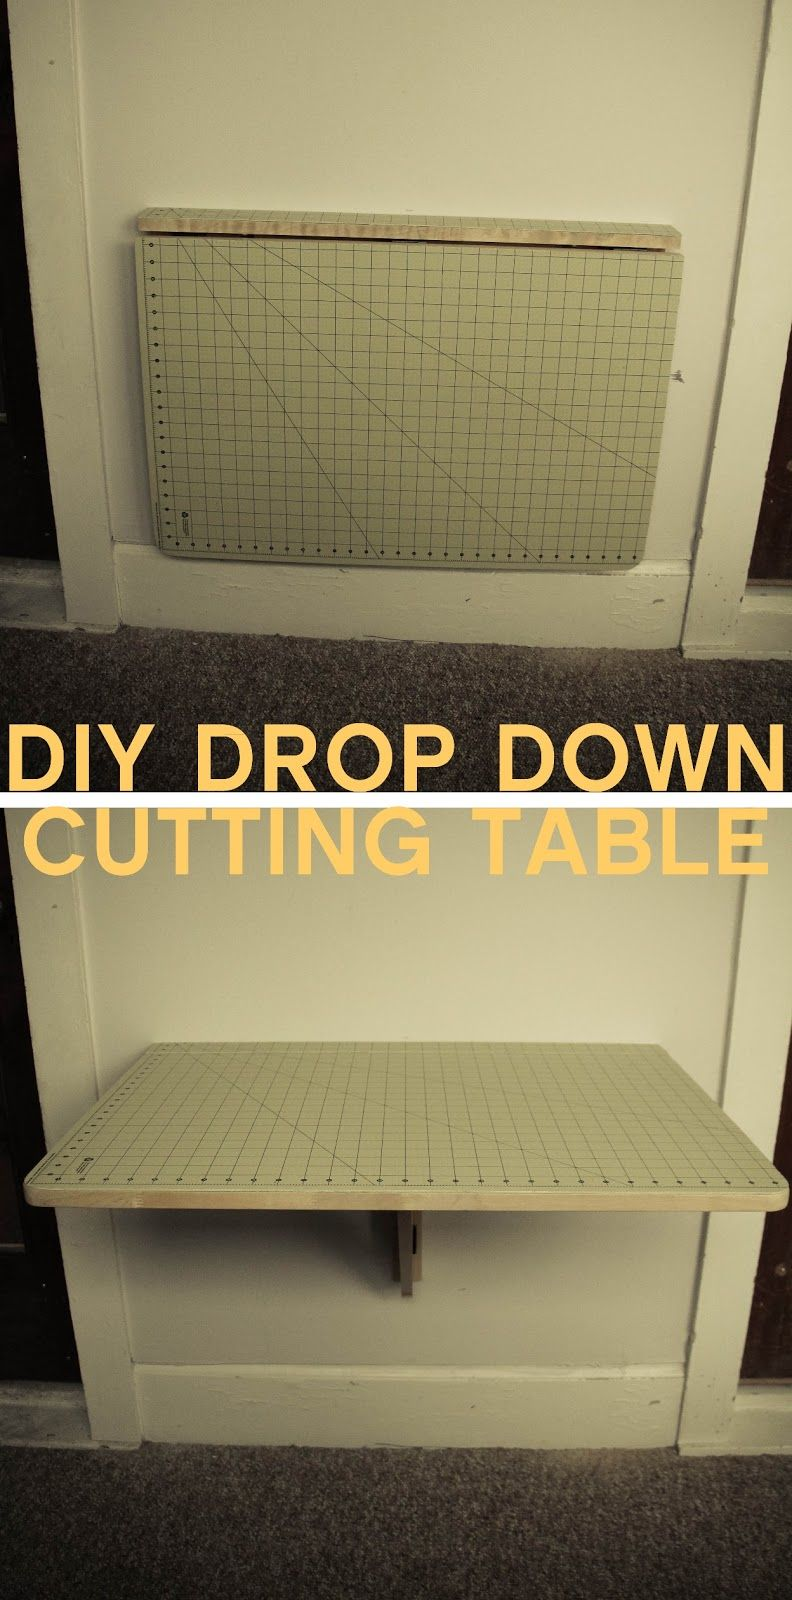 Diy ikea sewing table  Grosgrain DIY Drop Down Cutting Table  Creative space  Pinterest